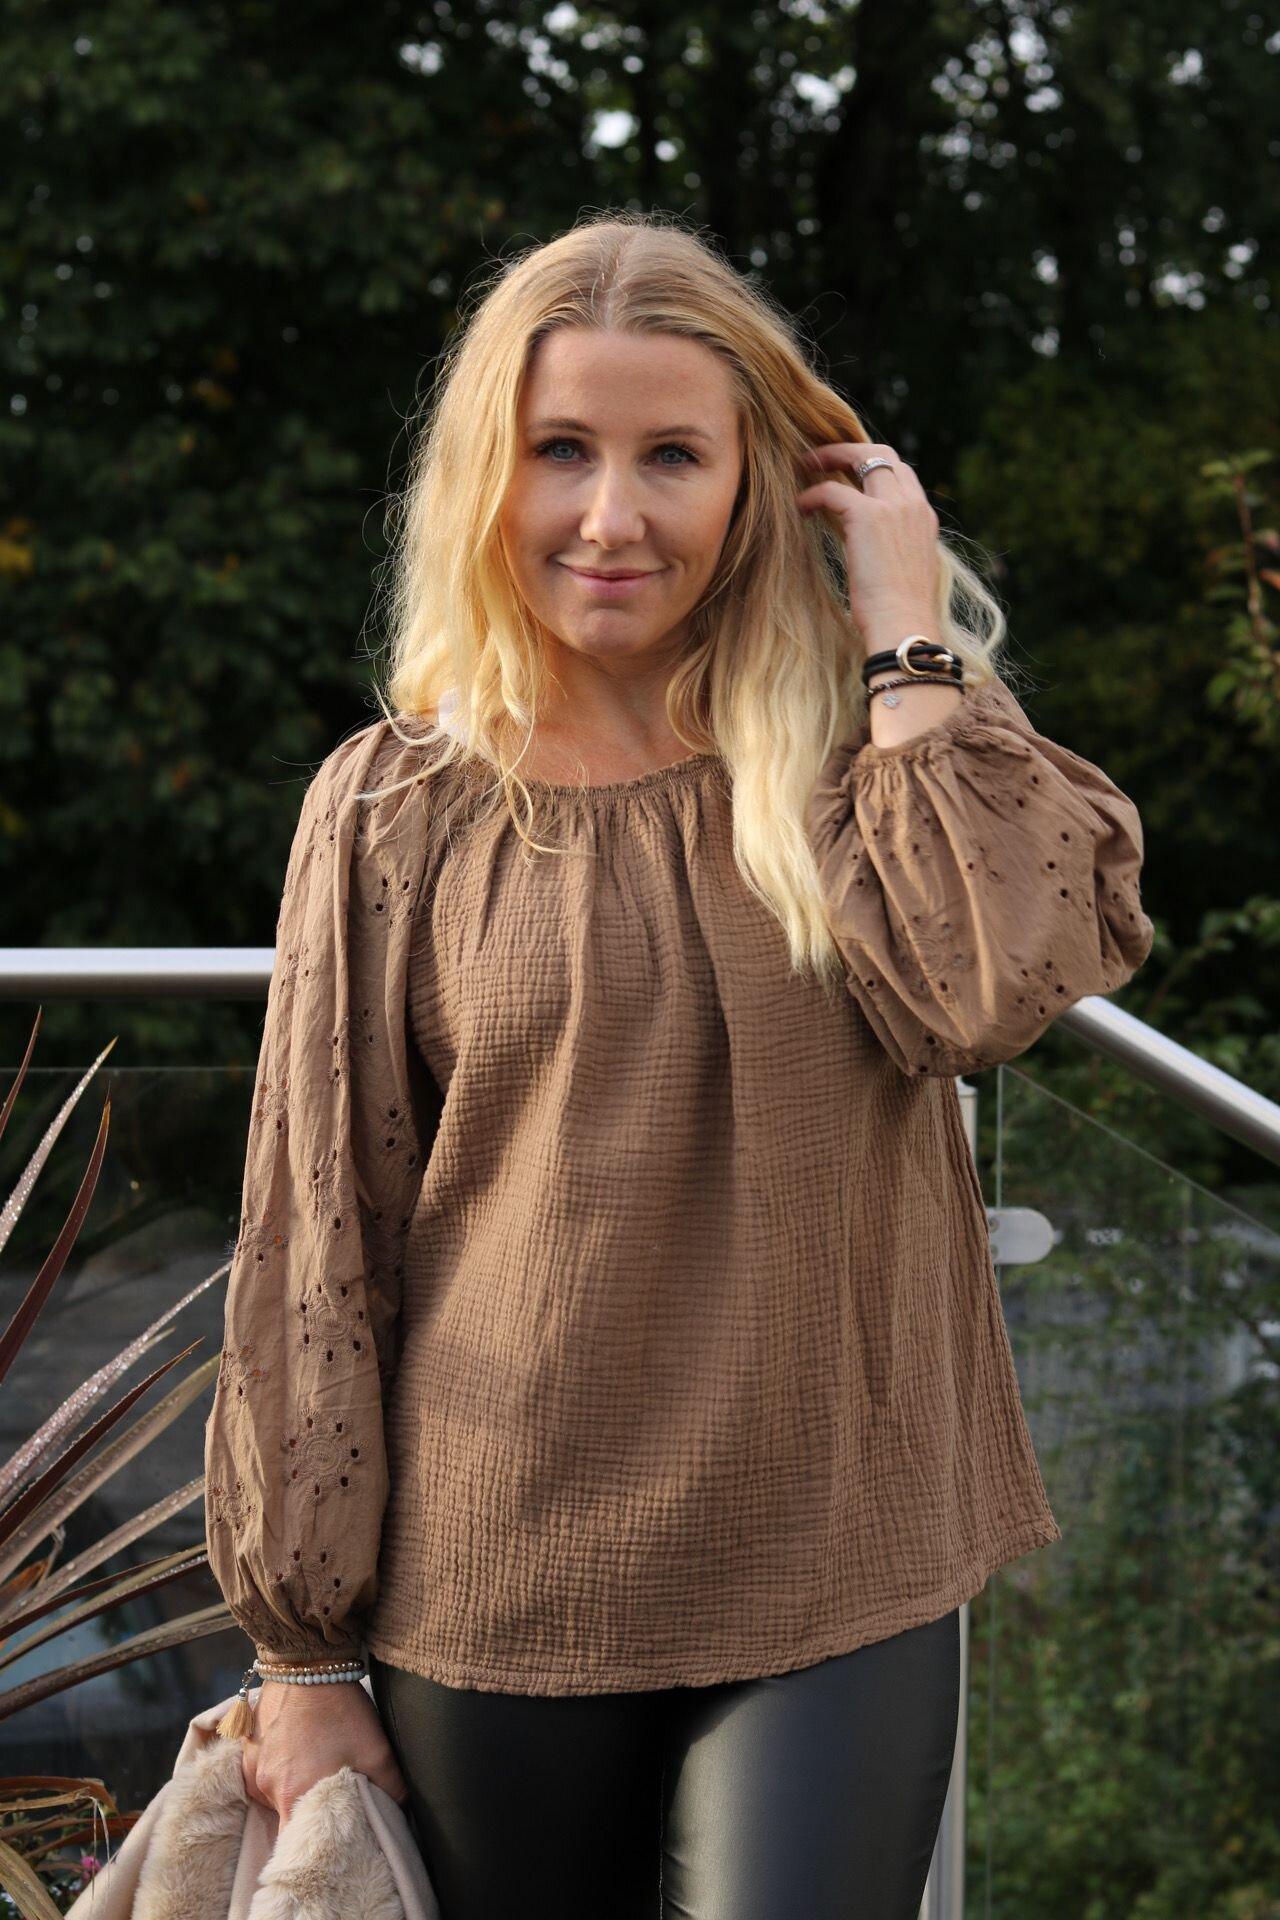 Lisbeth Tunika - Blonderermer - Mocca